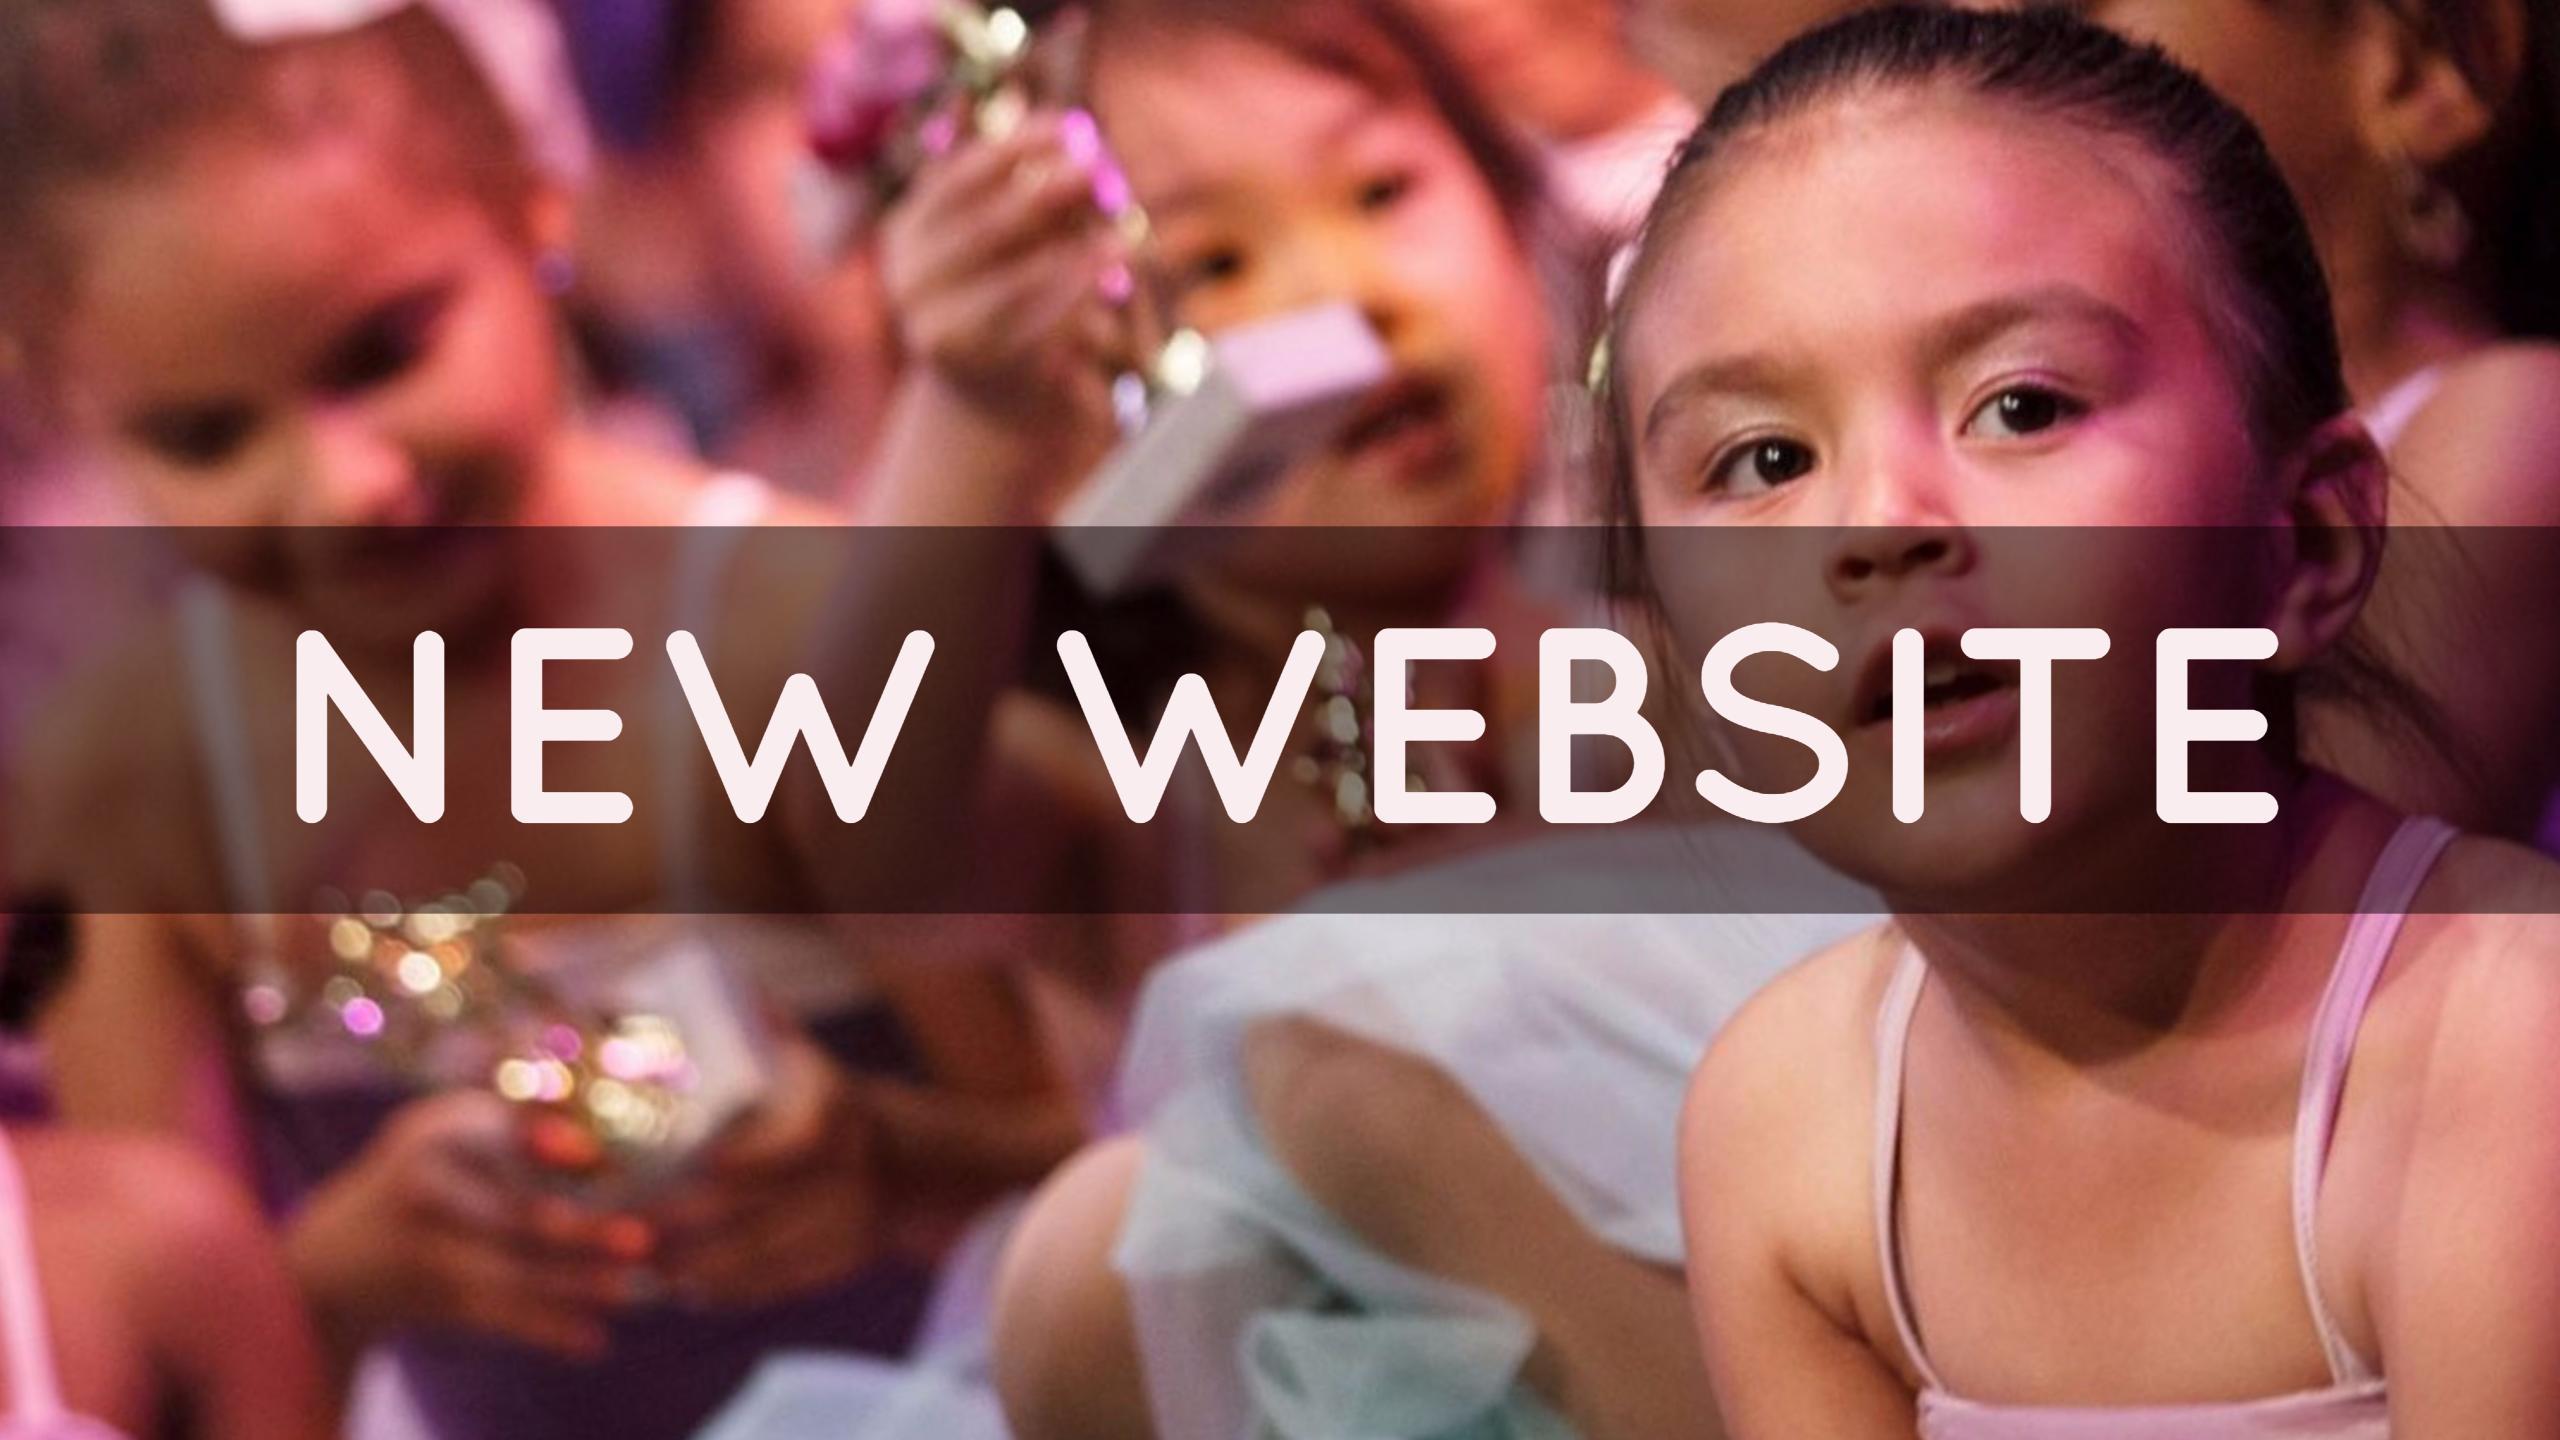 Our Brand-Spankin' New Website